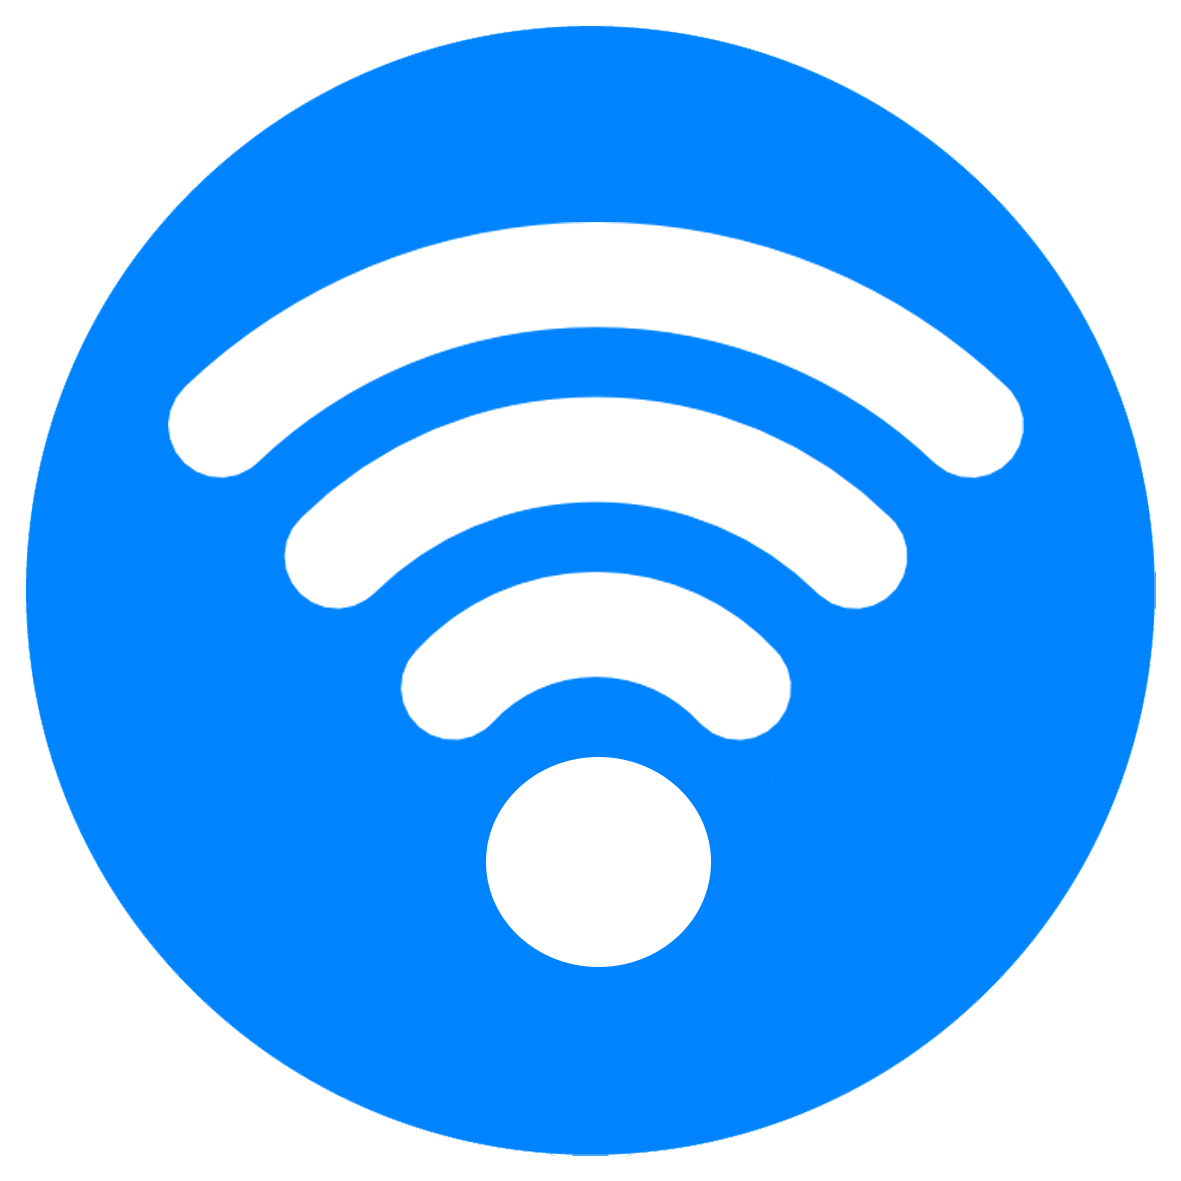 Wifi Icon Blue PNG Image - PurePNG | Free transparent CC0 ...